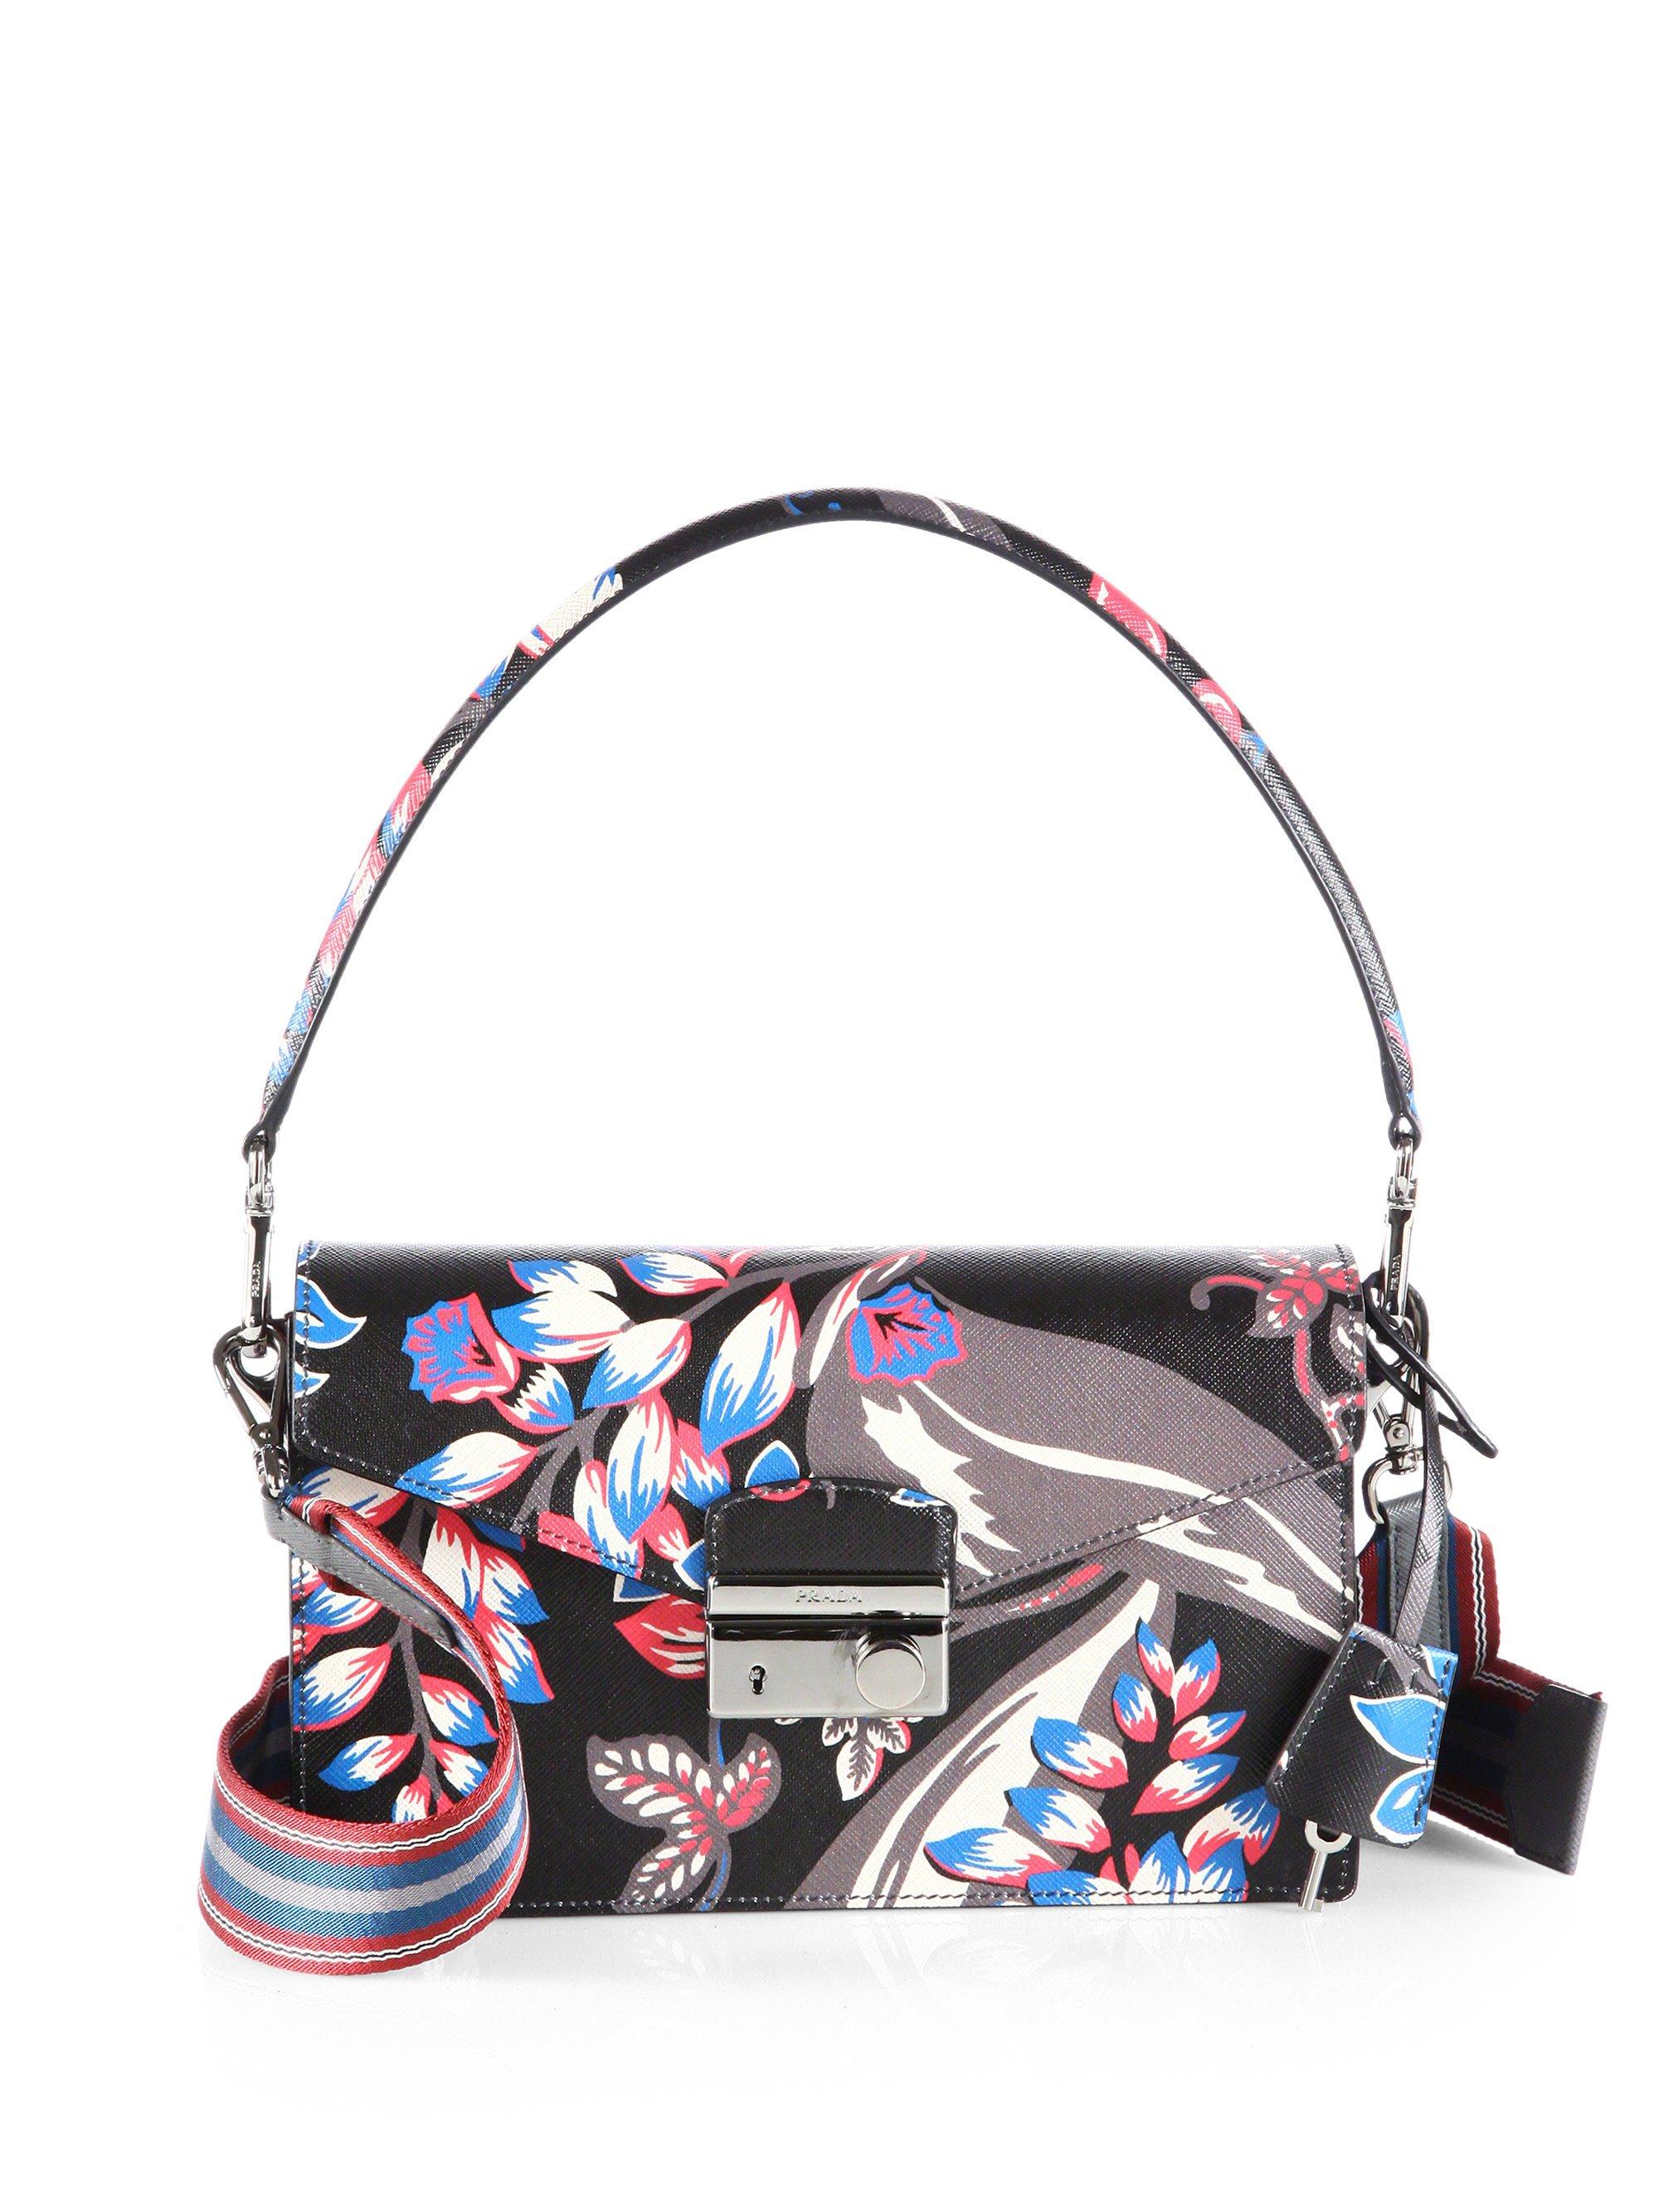 prada nylon shopper tote - prada leopard-print calfskin flap shoulder bag, prada knockoffs purses